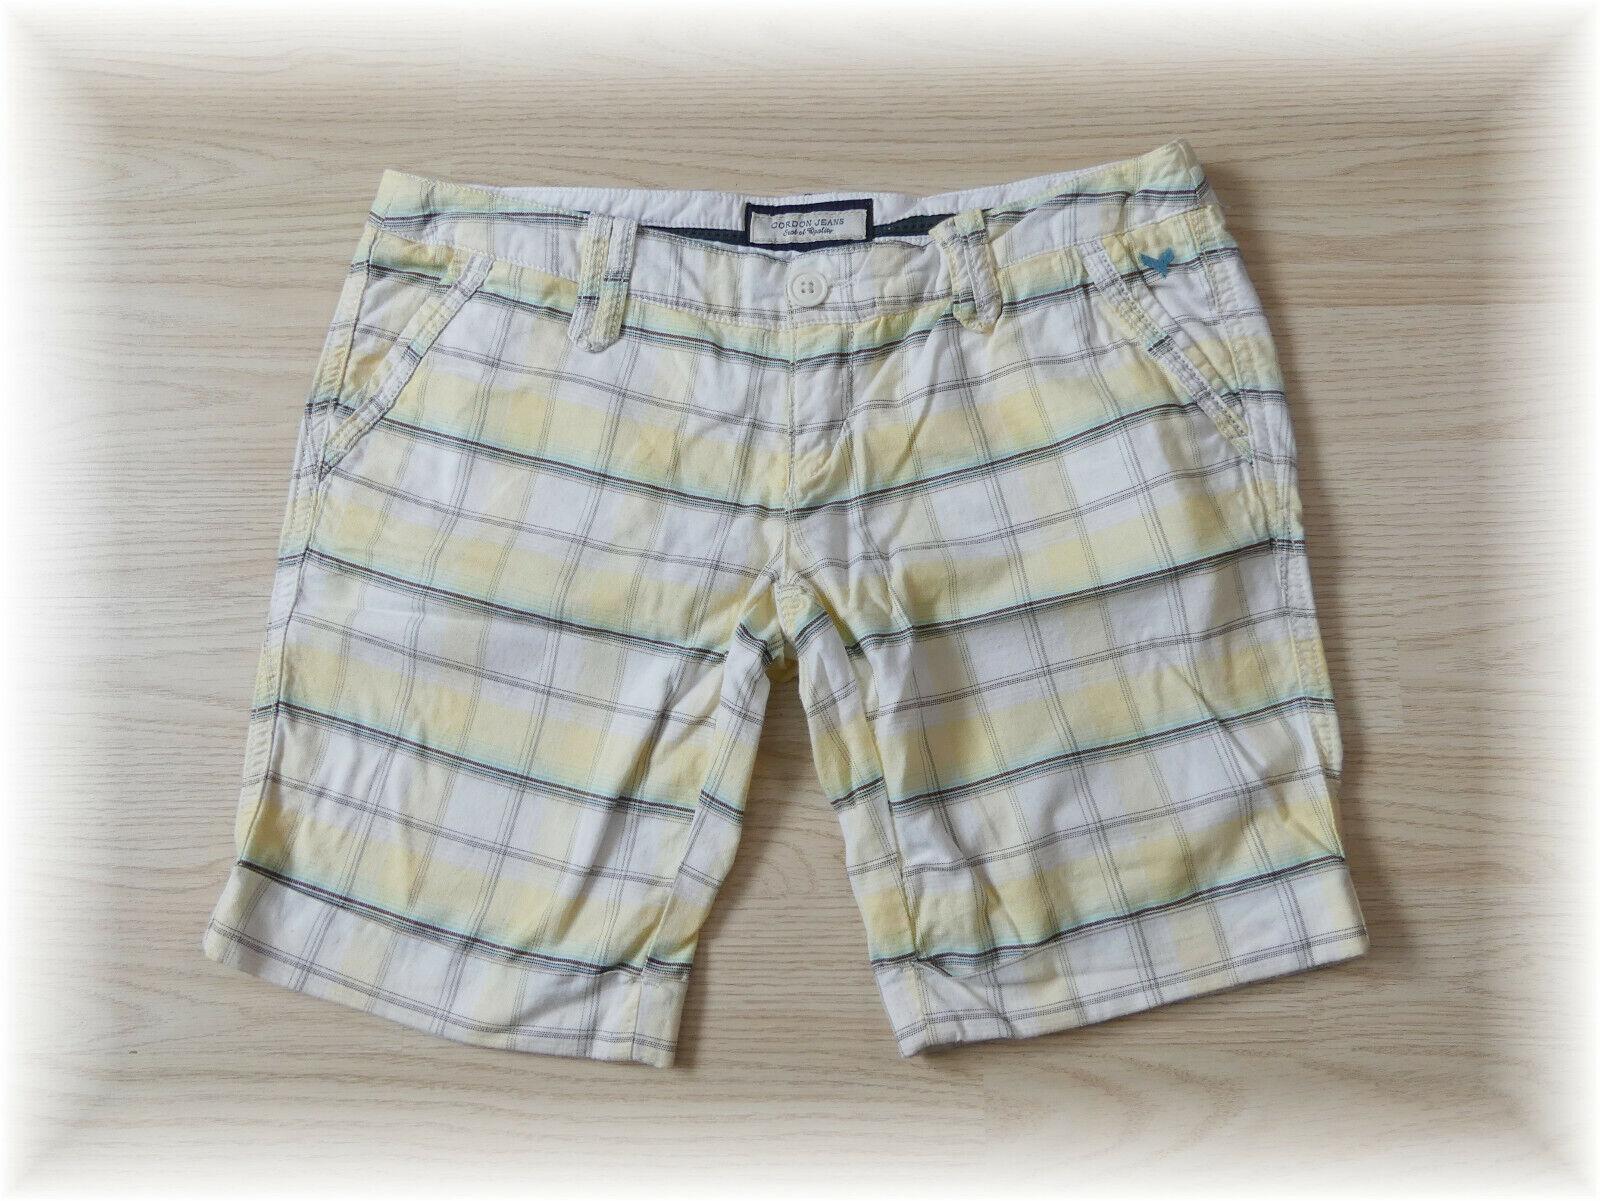 Cordon Jeans * kurze Hose Karo Shorts Freizeit * Gr. 36 (26)